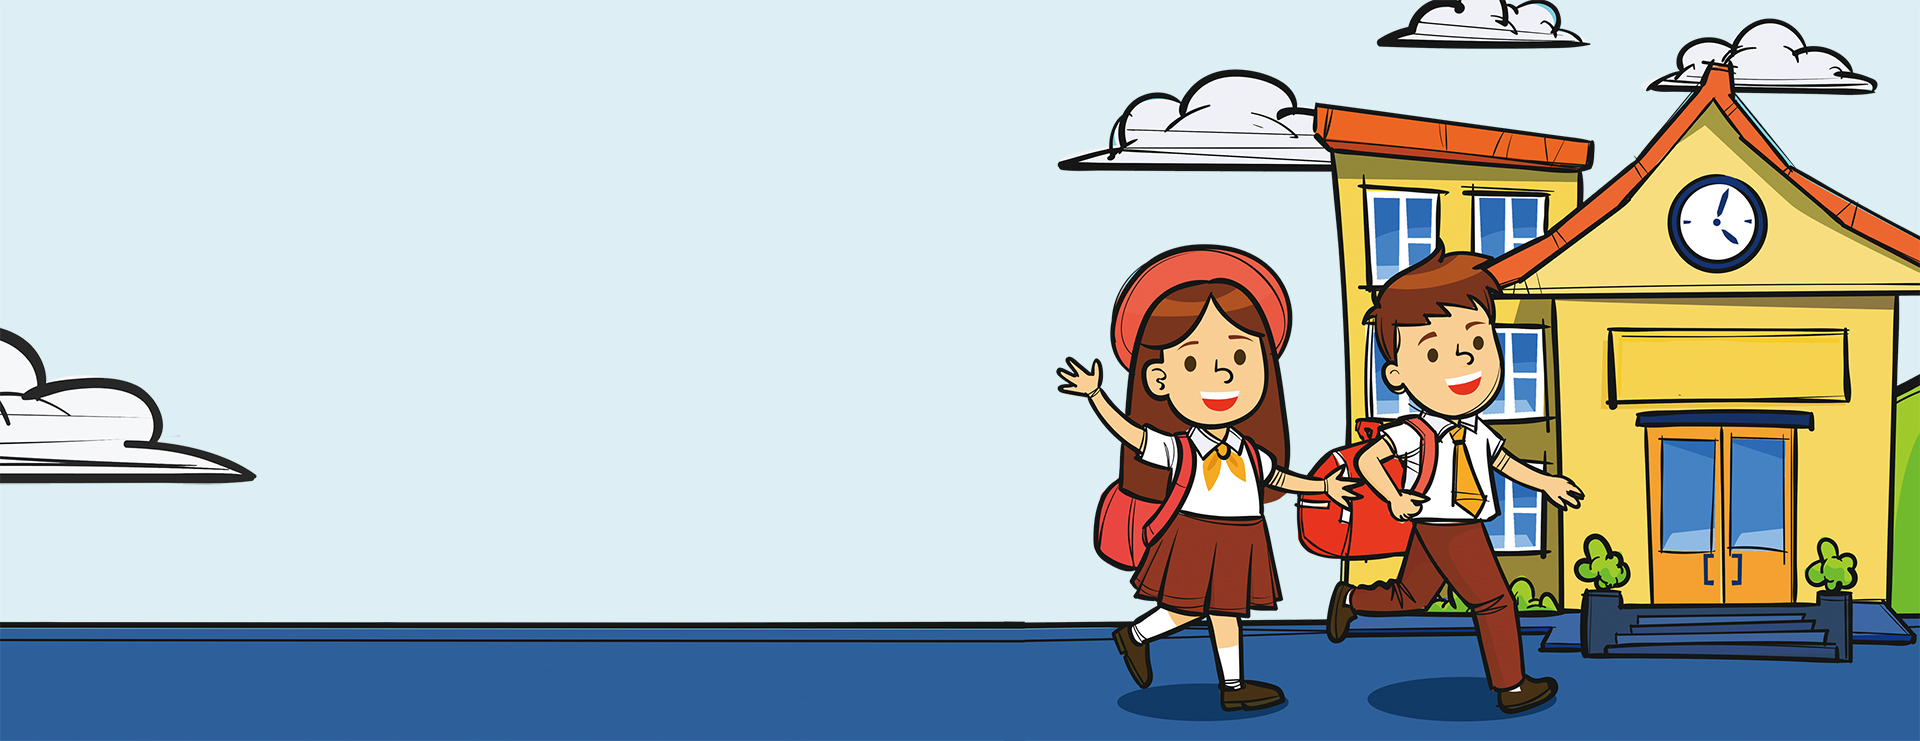 escola infantil no banner azul dos desenhos animados a